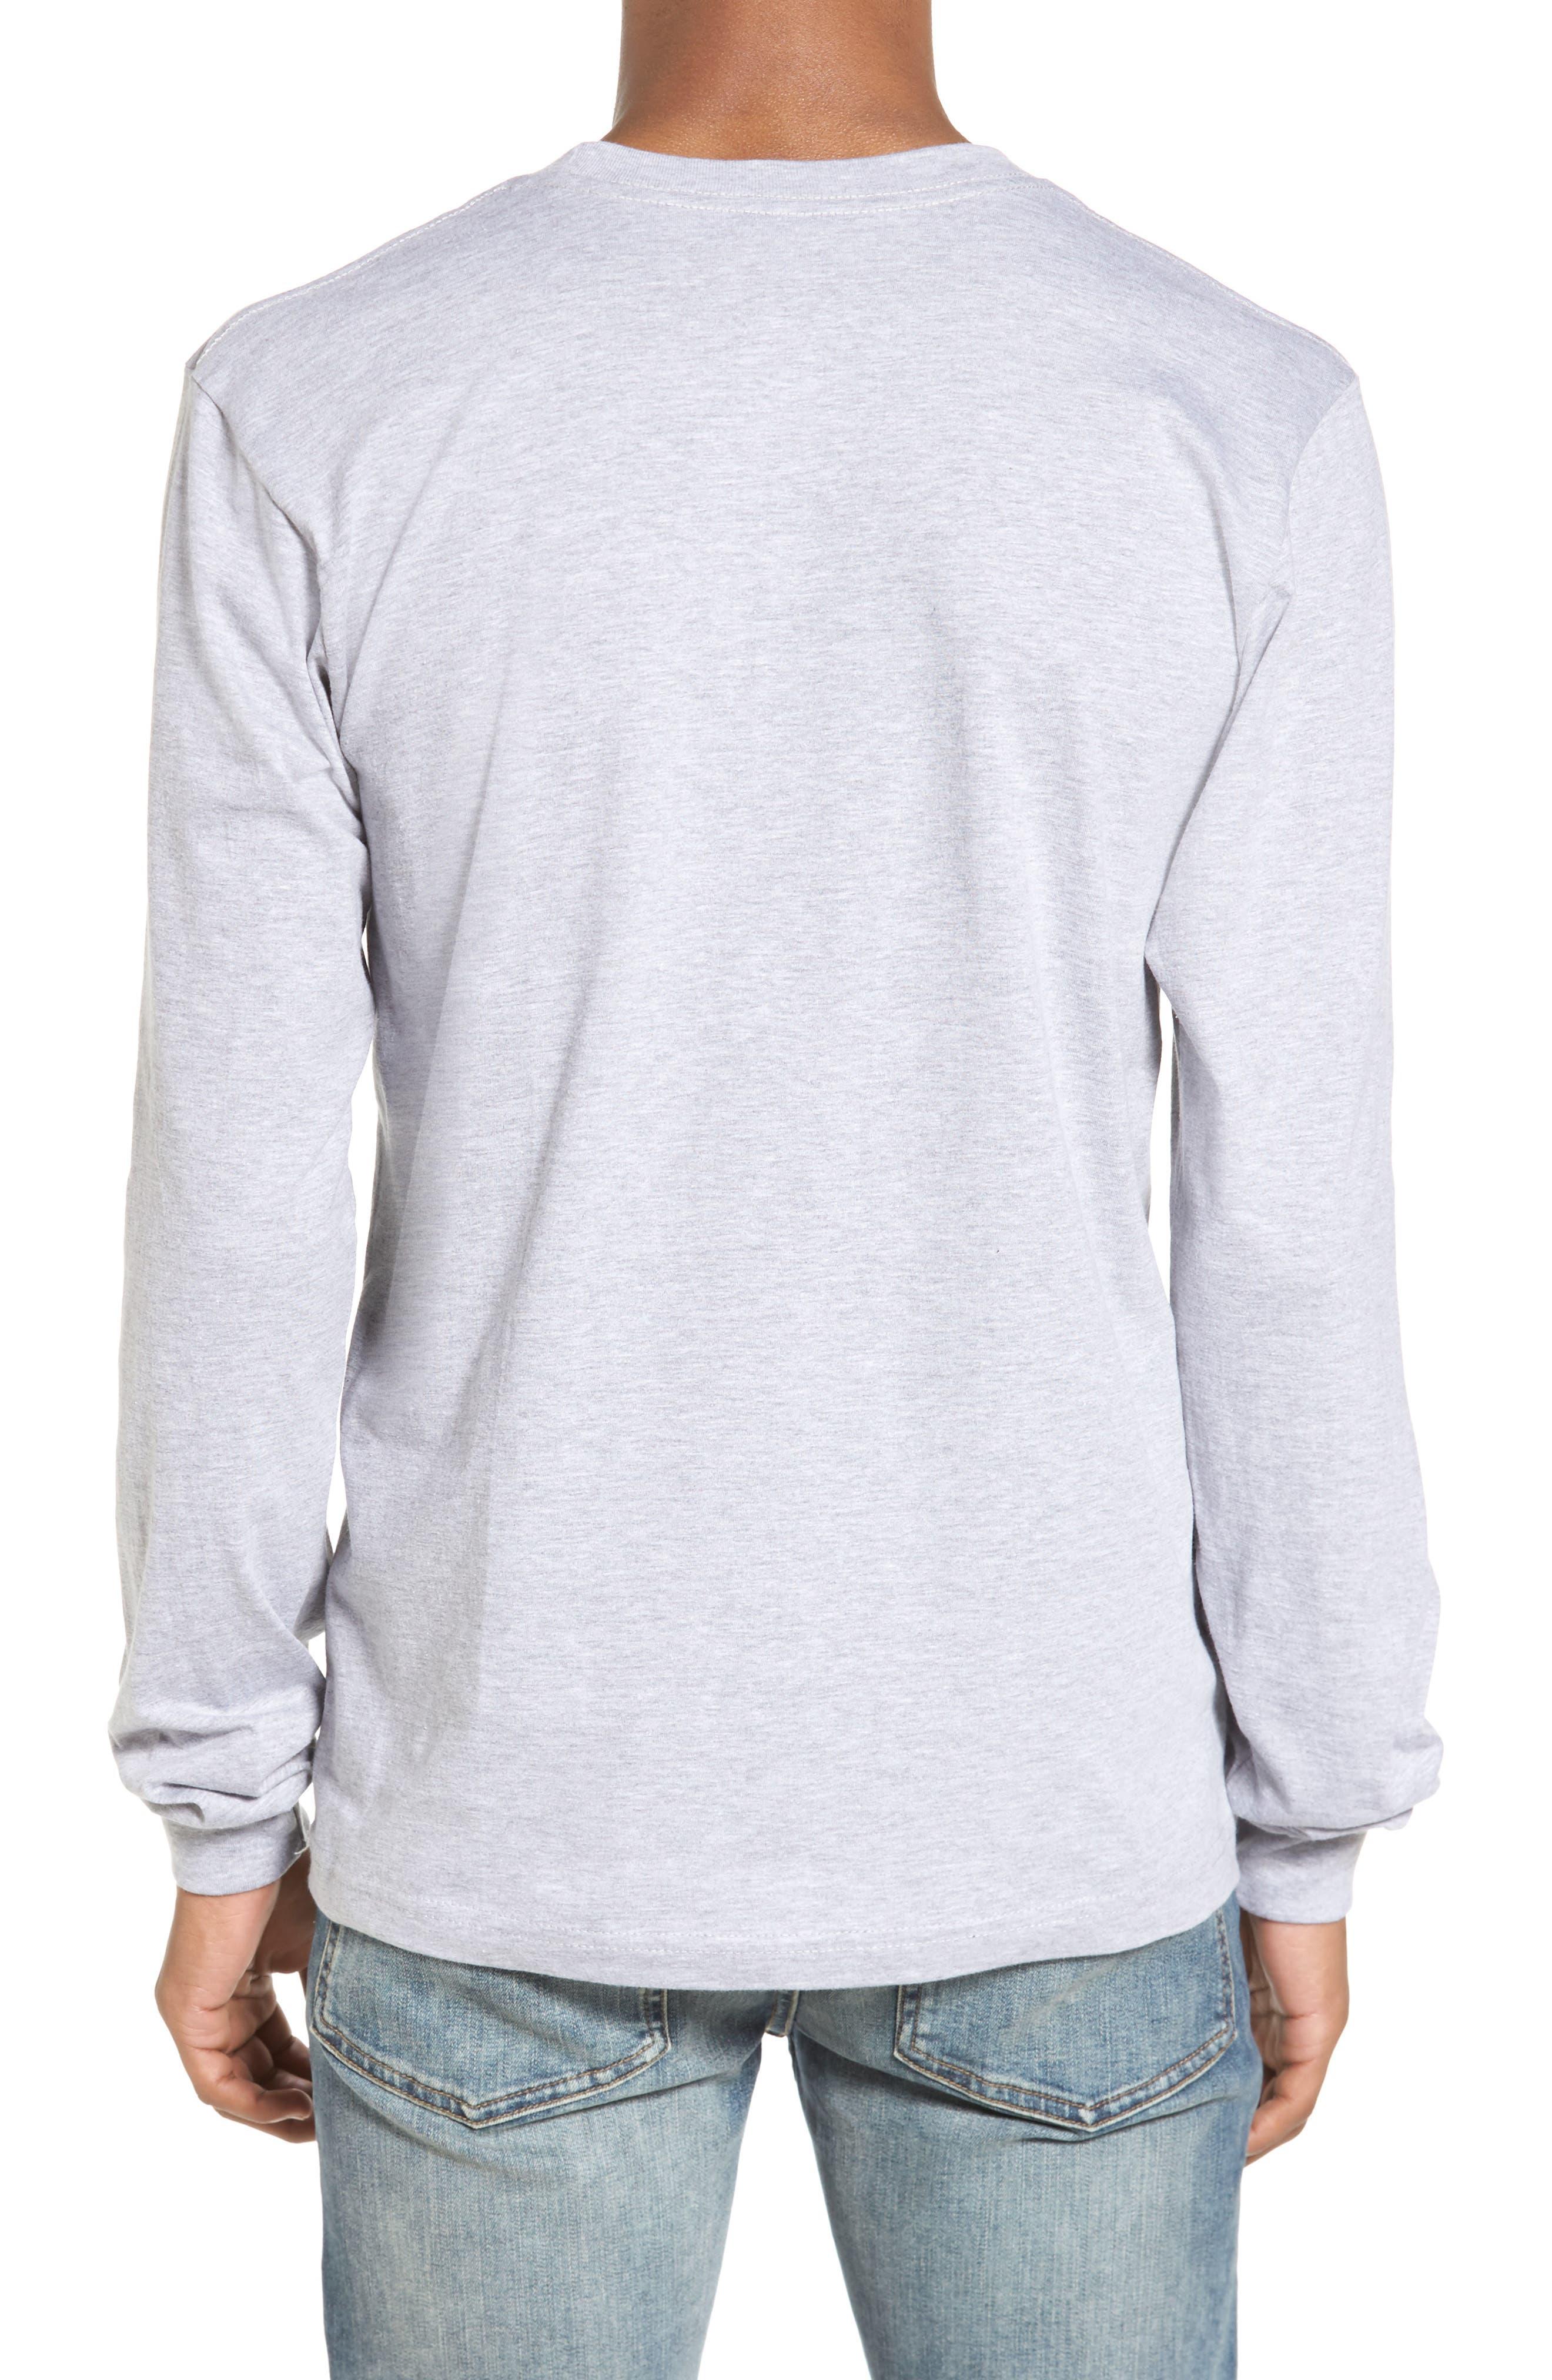 PNW Shield Sweatshirt,                             Alternate thumbnail 2, color,                             020